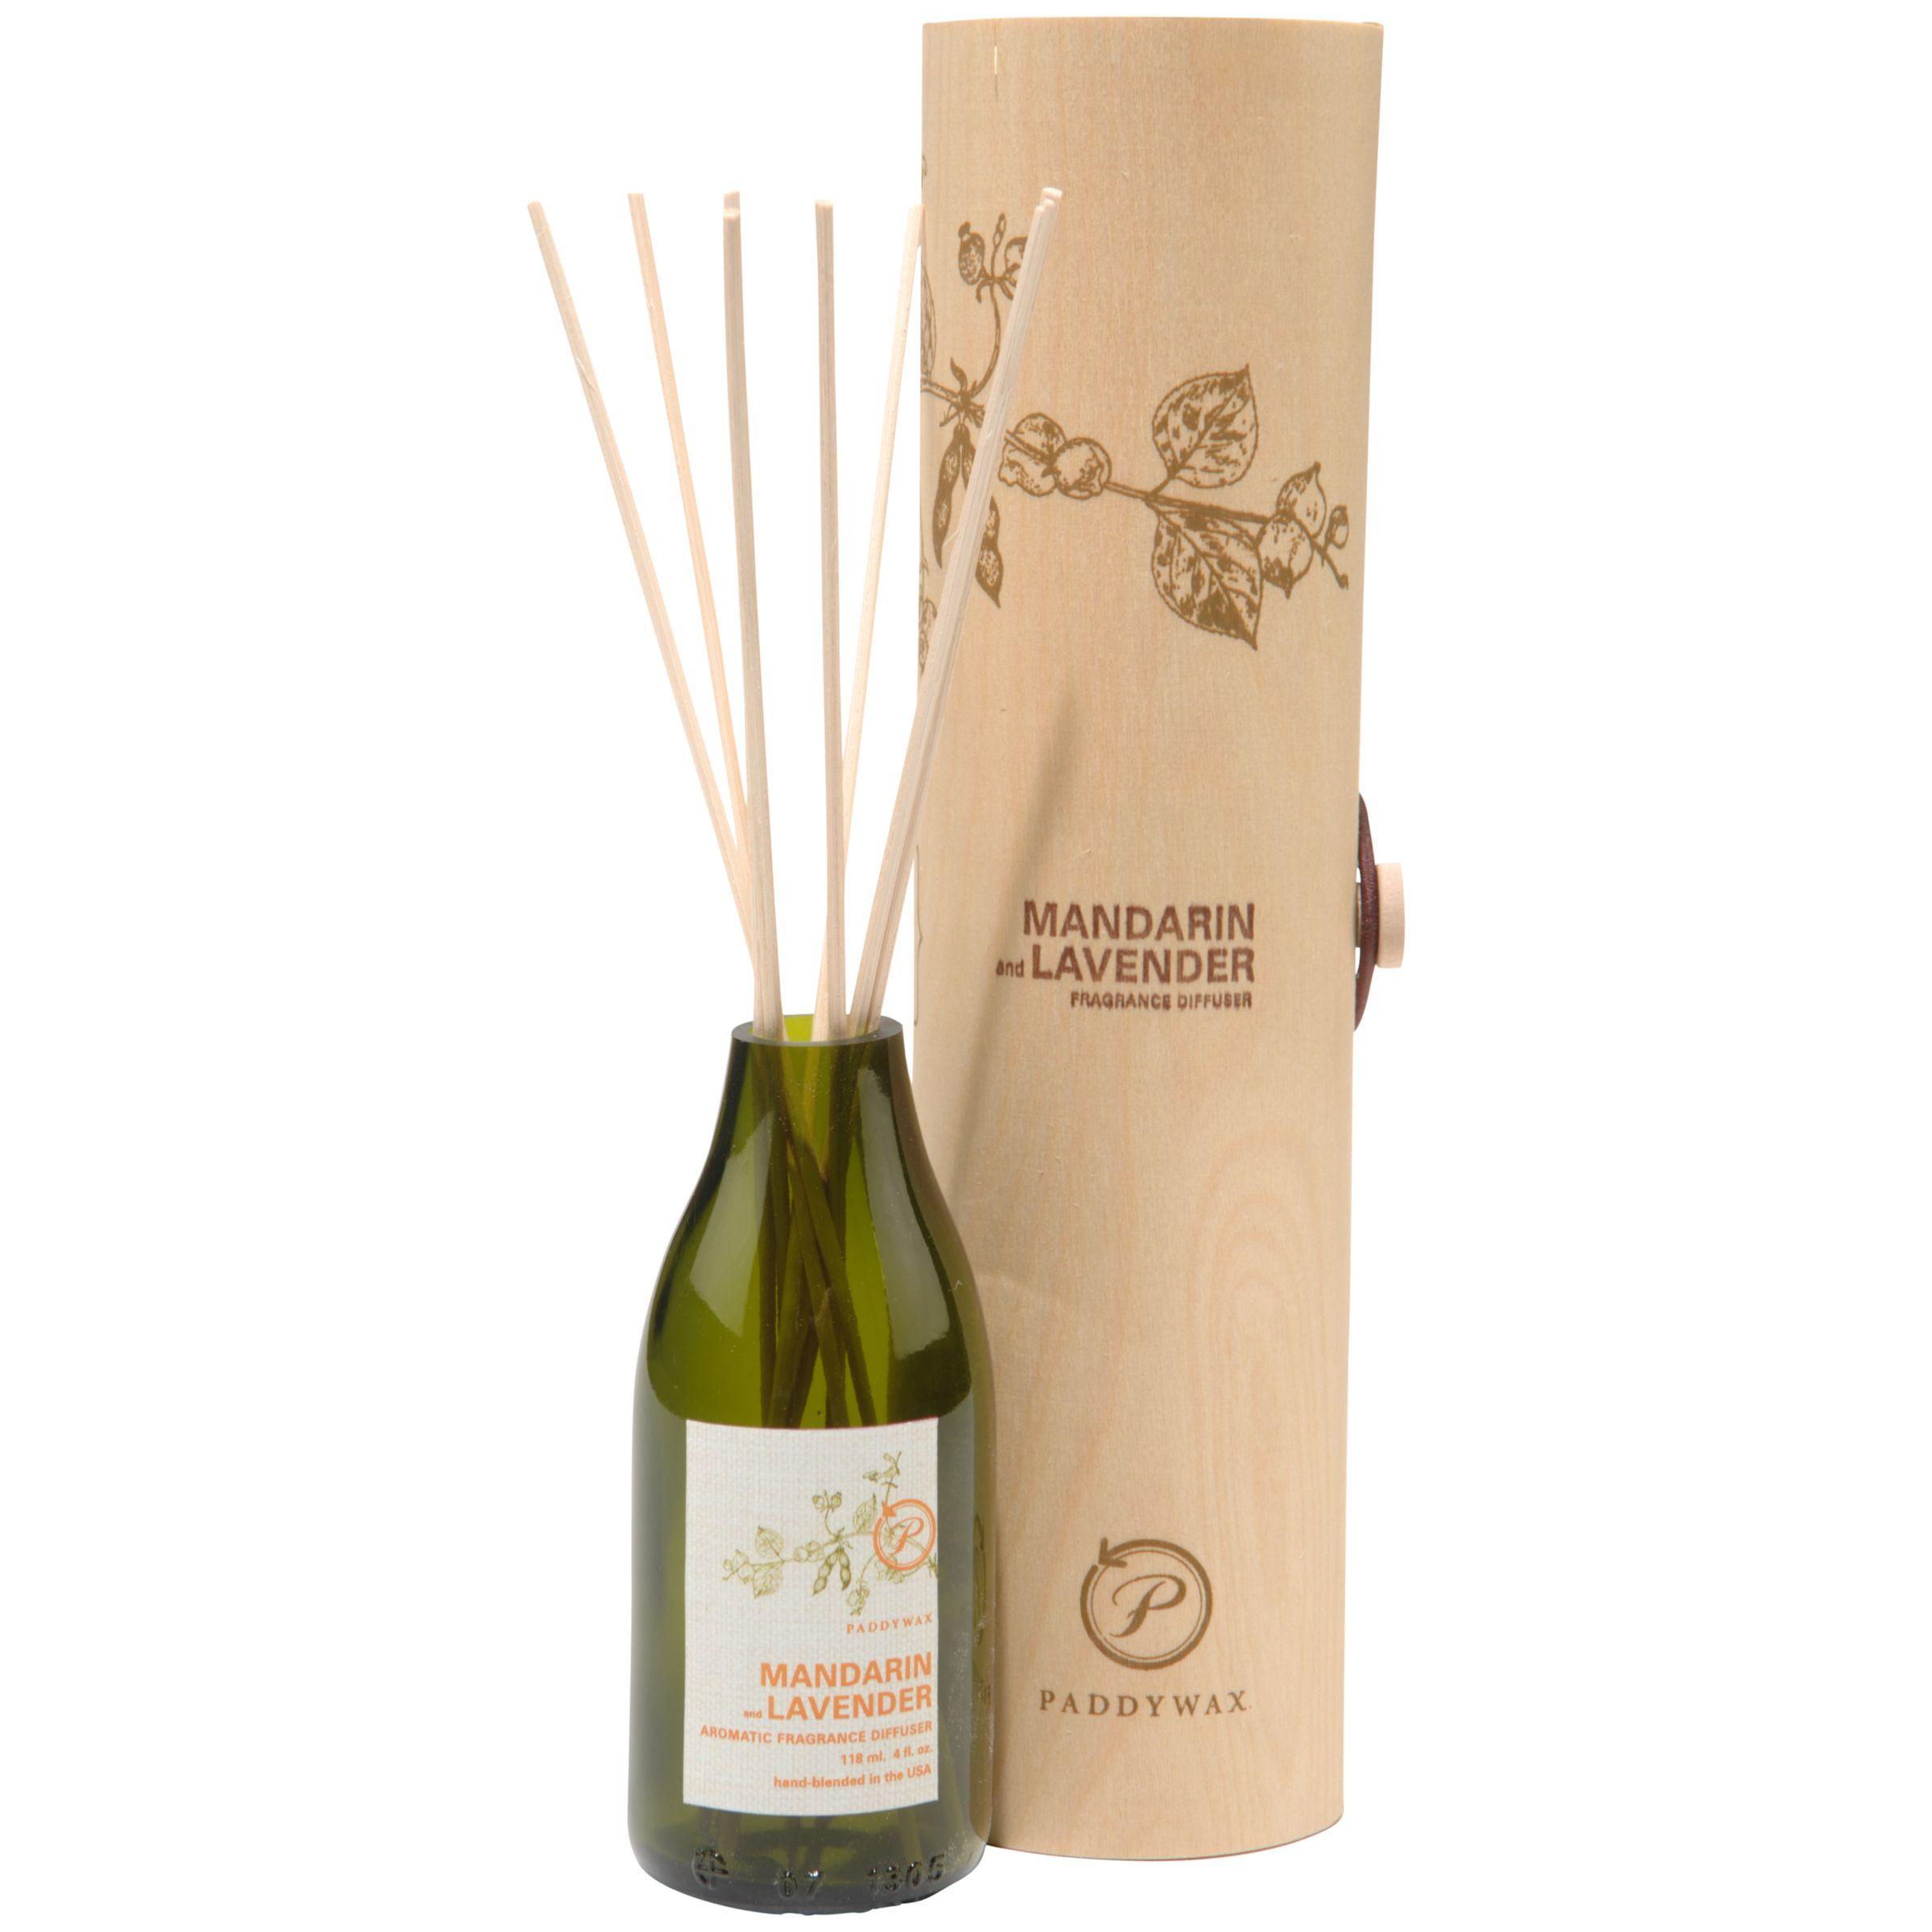 Paddywax Paddywax Ecogreen Mandarin And Lavender Diffuser, 120ml